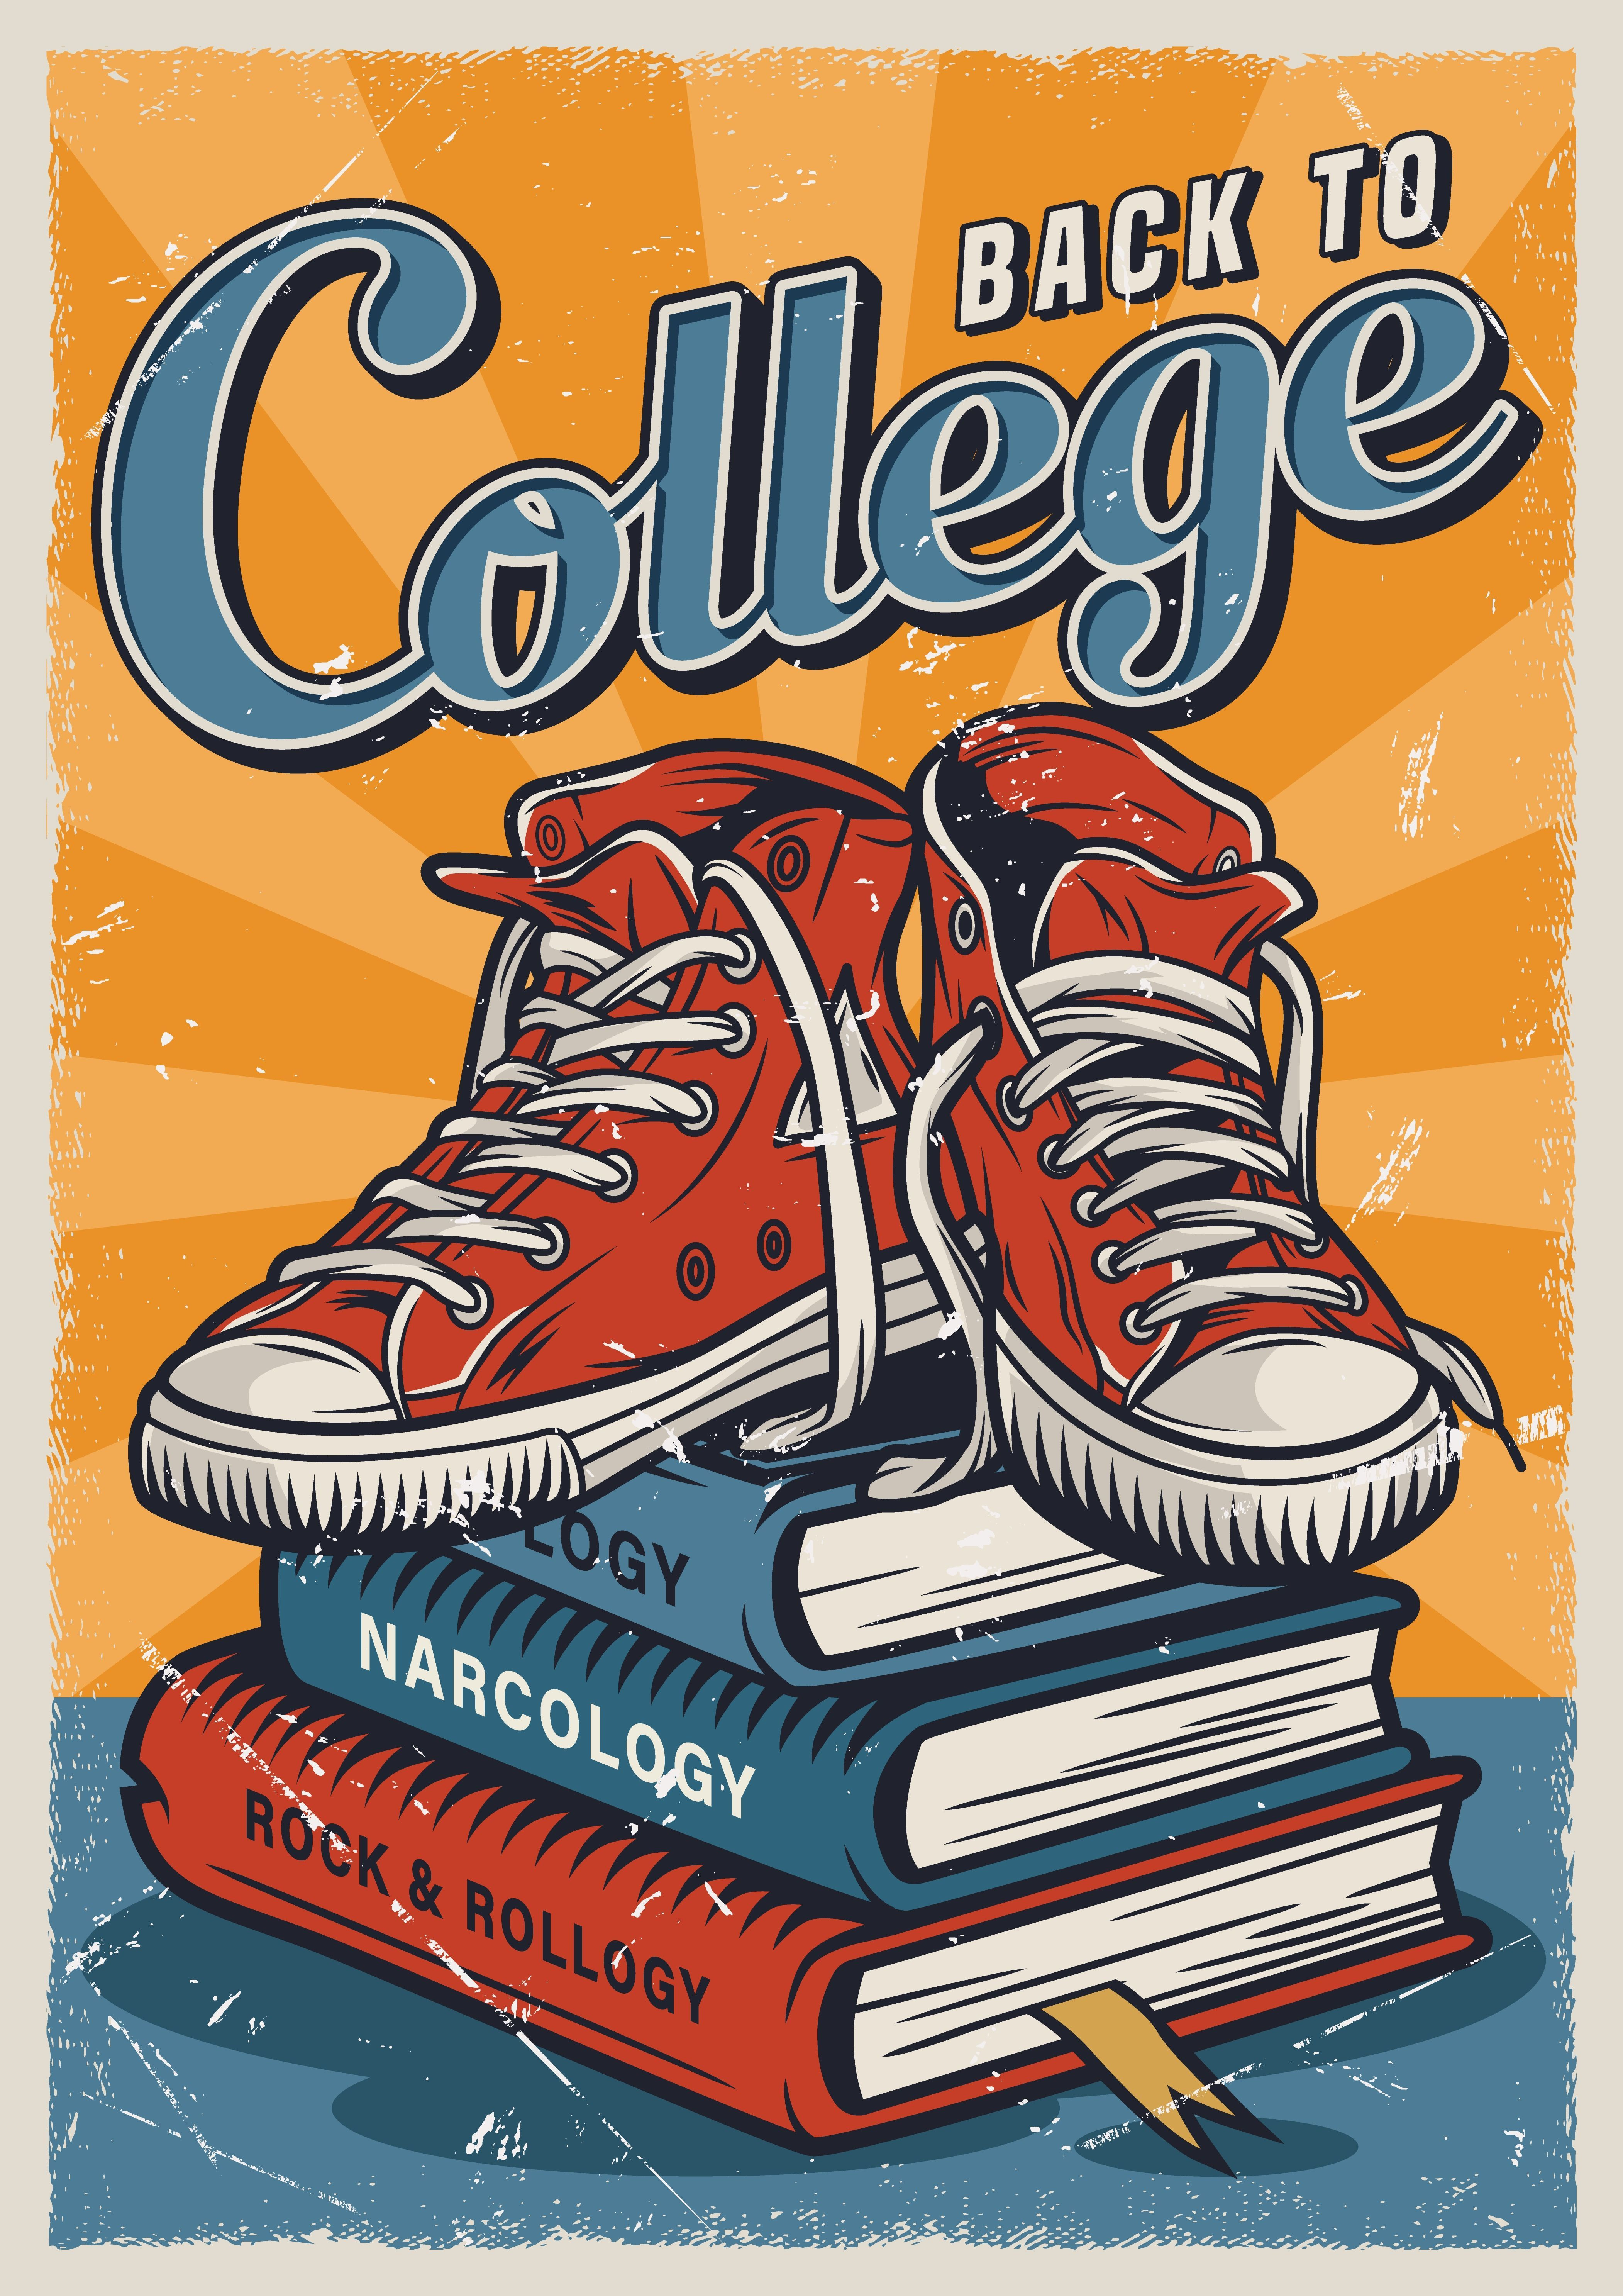 16 Vintage College Advertising Posters Click On The Link To Find More College Posters Super Quality Fully Ilustrasi Karakter Ilustrasi Grafis Sejarah Kuno